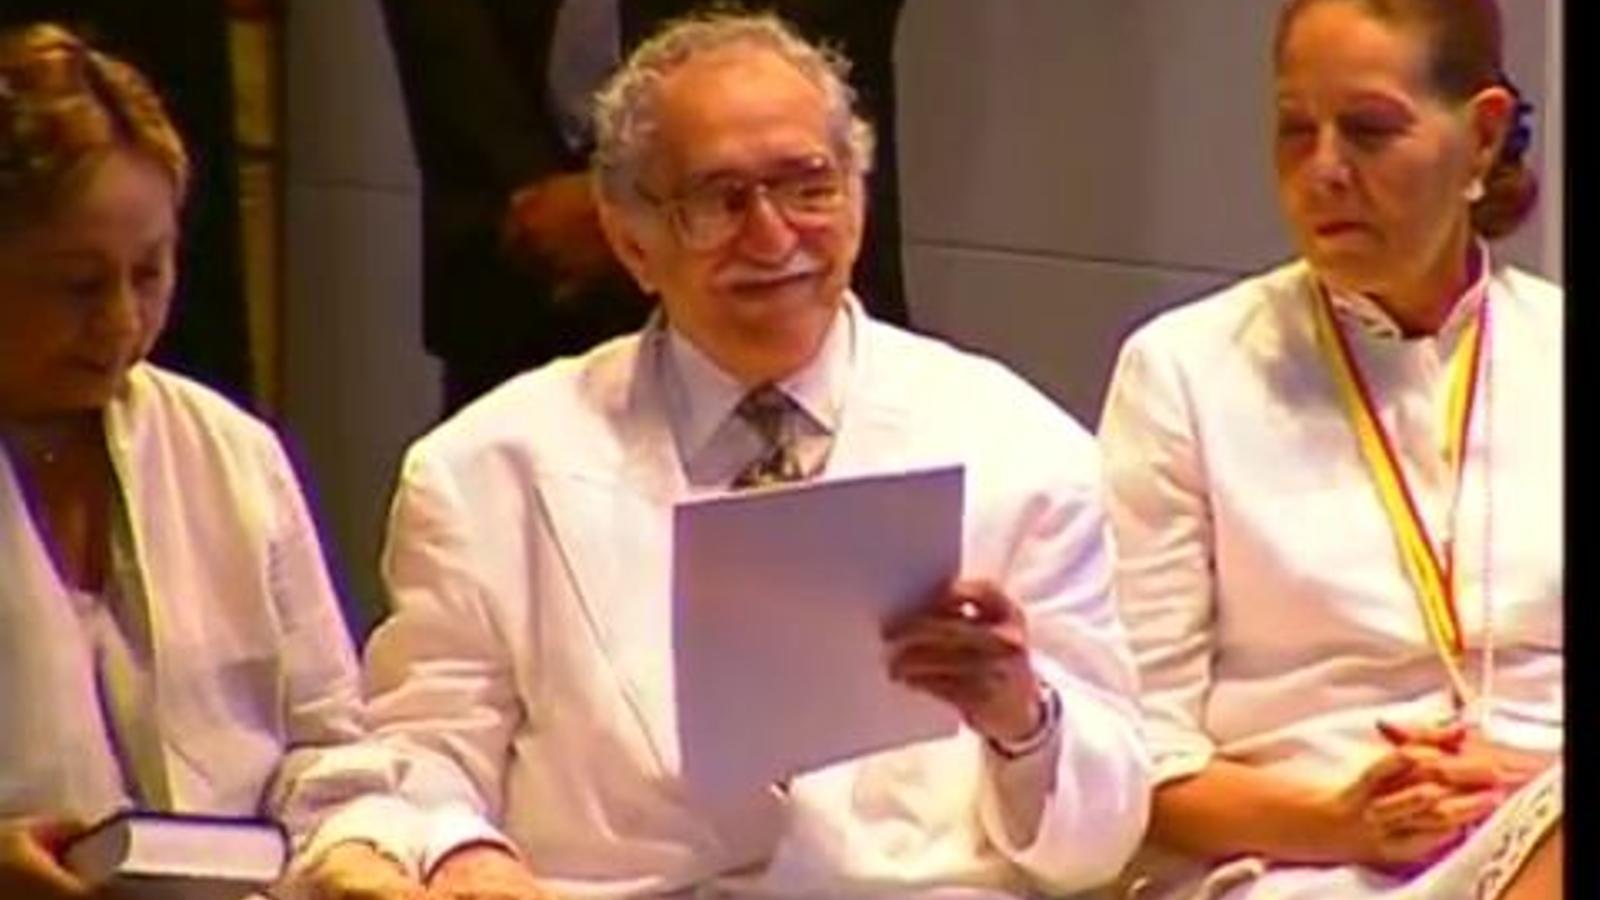 Discurs de Gabriel García Márquez durant el IV Congrés Internacional de la Llengua Espanyola